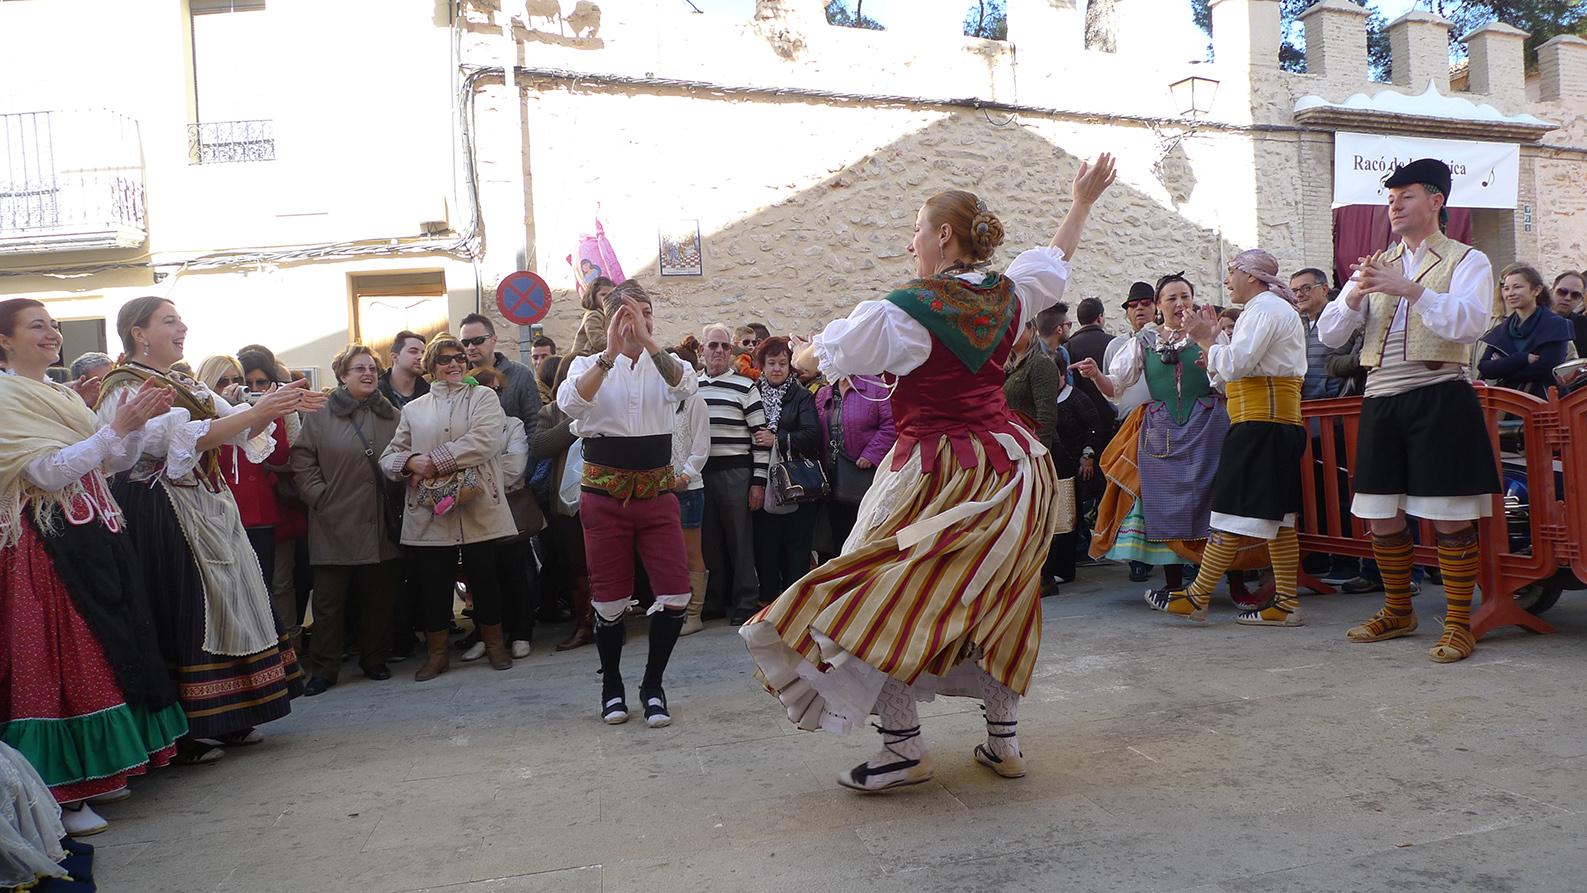 2014-02-23 - Baladre a Fira St. Marcia-ROTOVA (41)